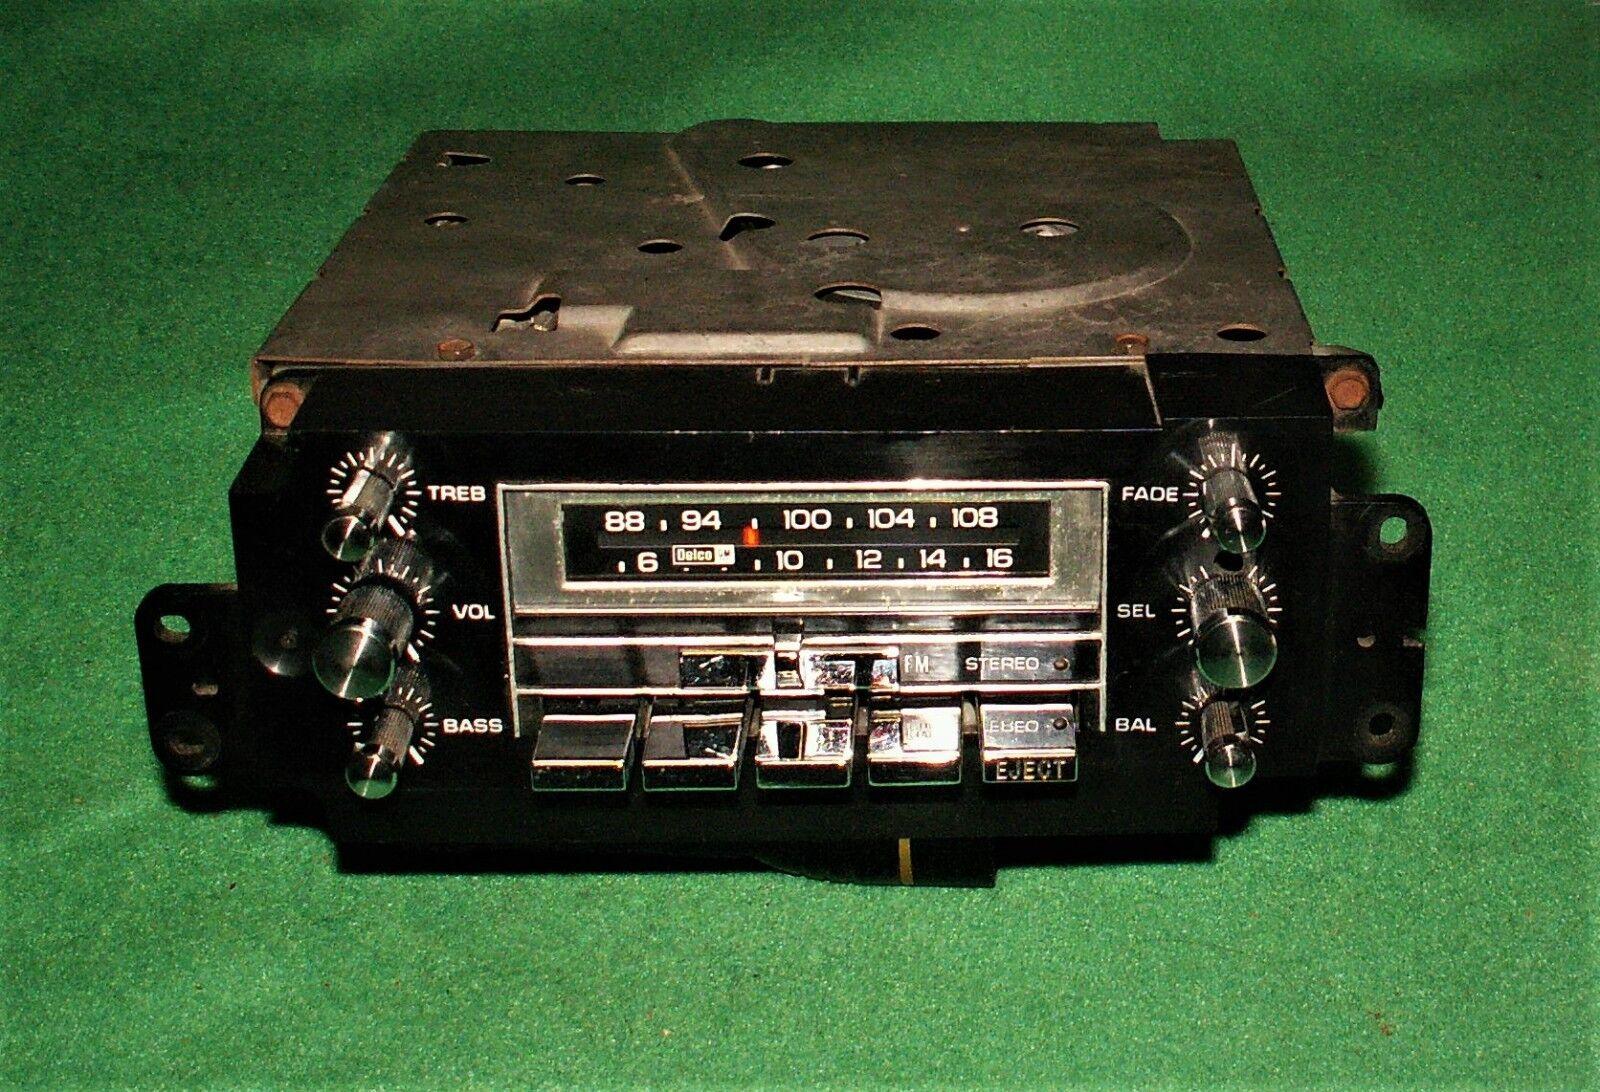 🔥? VERY RARE CHEVROLET BUICK PONTIAC OLDSMOBILE CADILLAC AM FM 8 TRACK MULTIPLEX